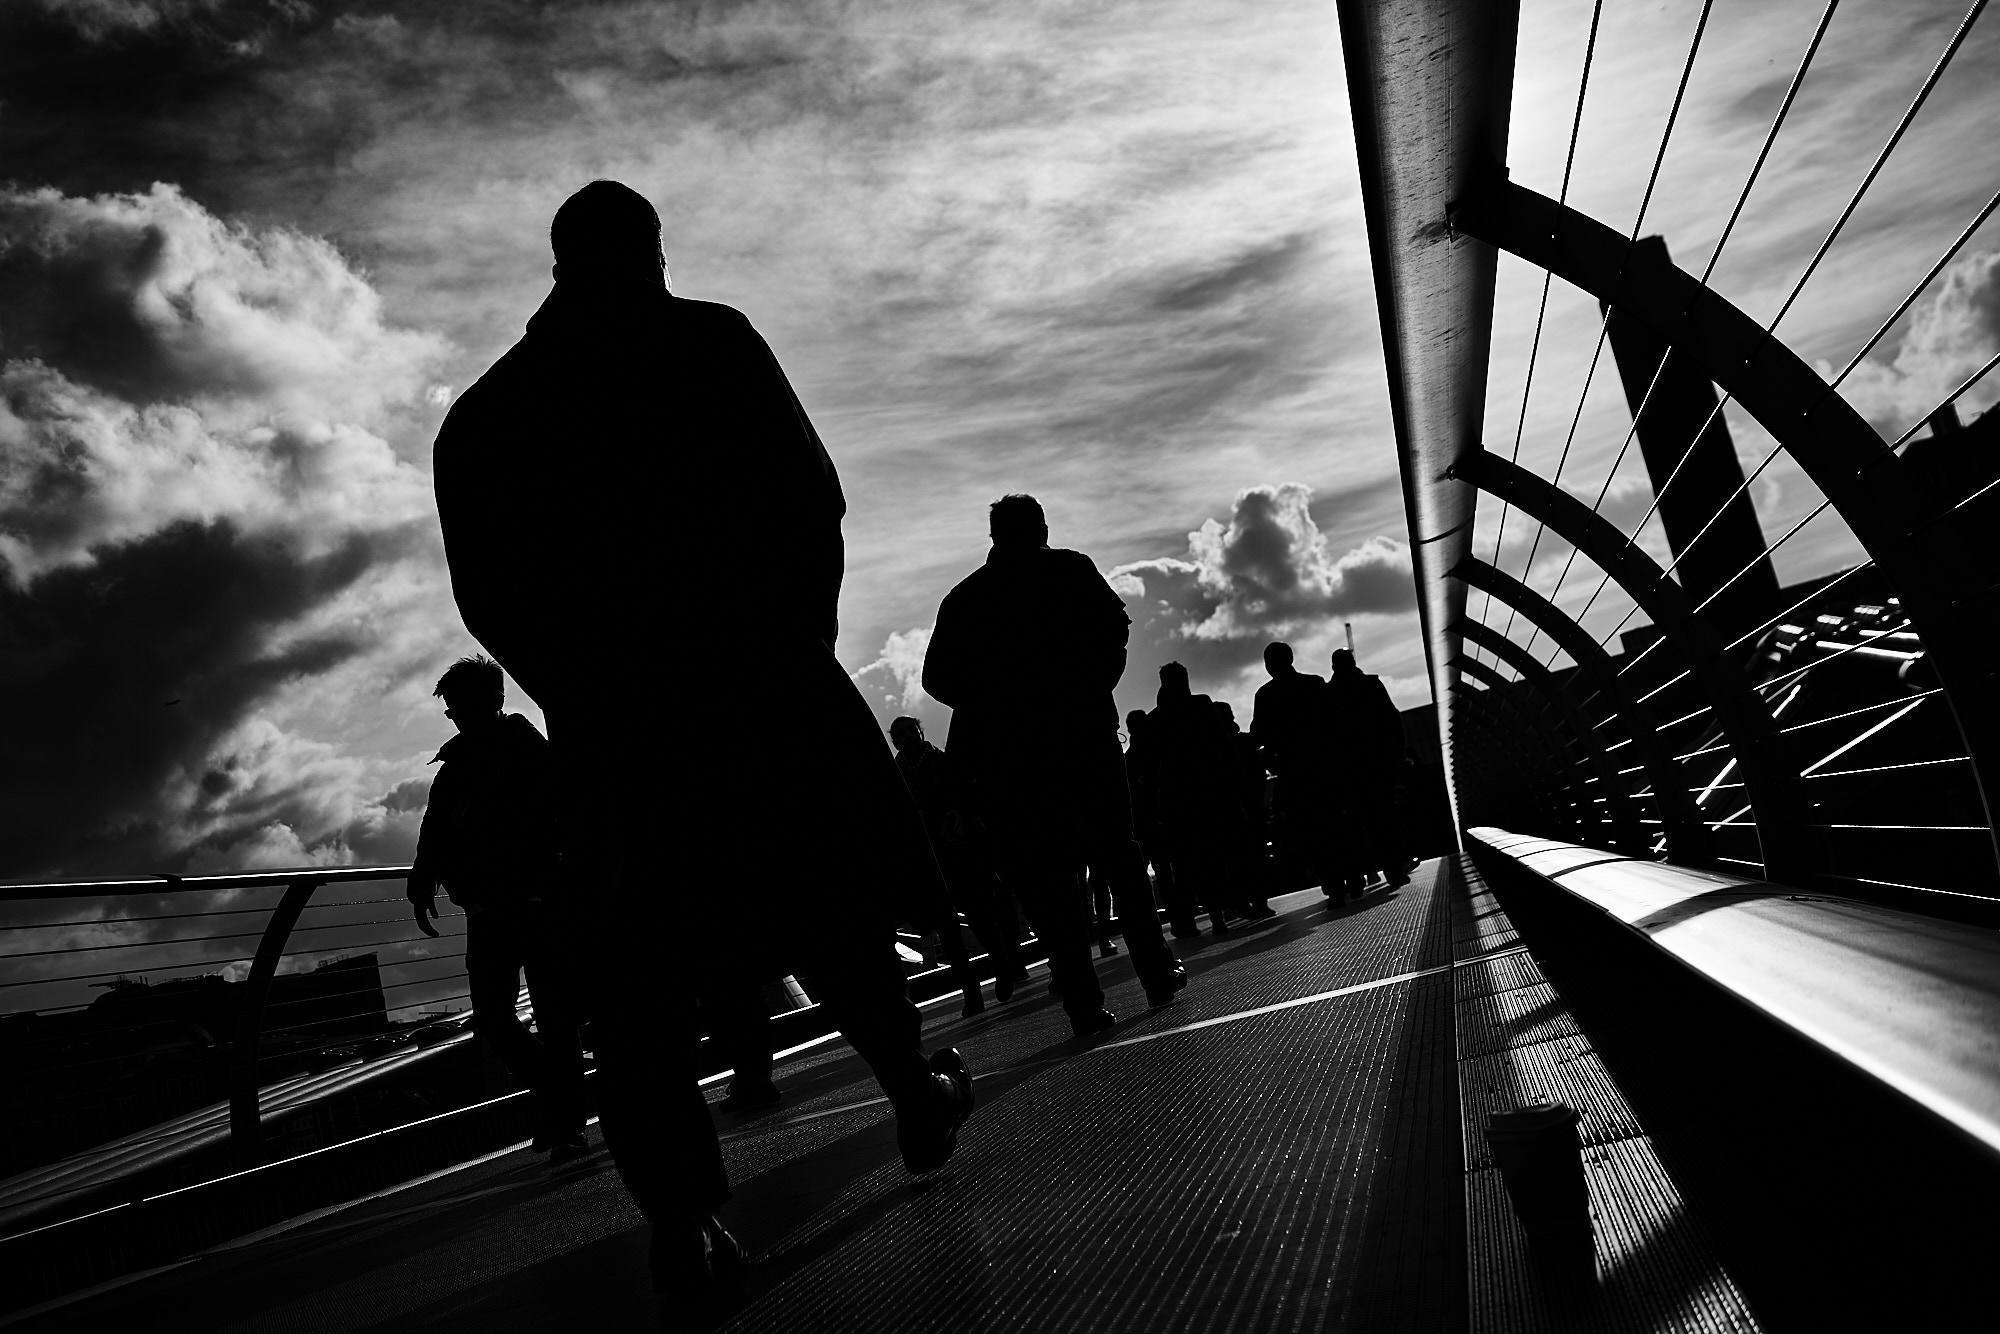 sony a7r street photography london golden eye